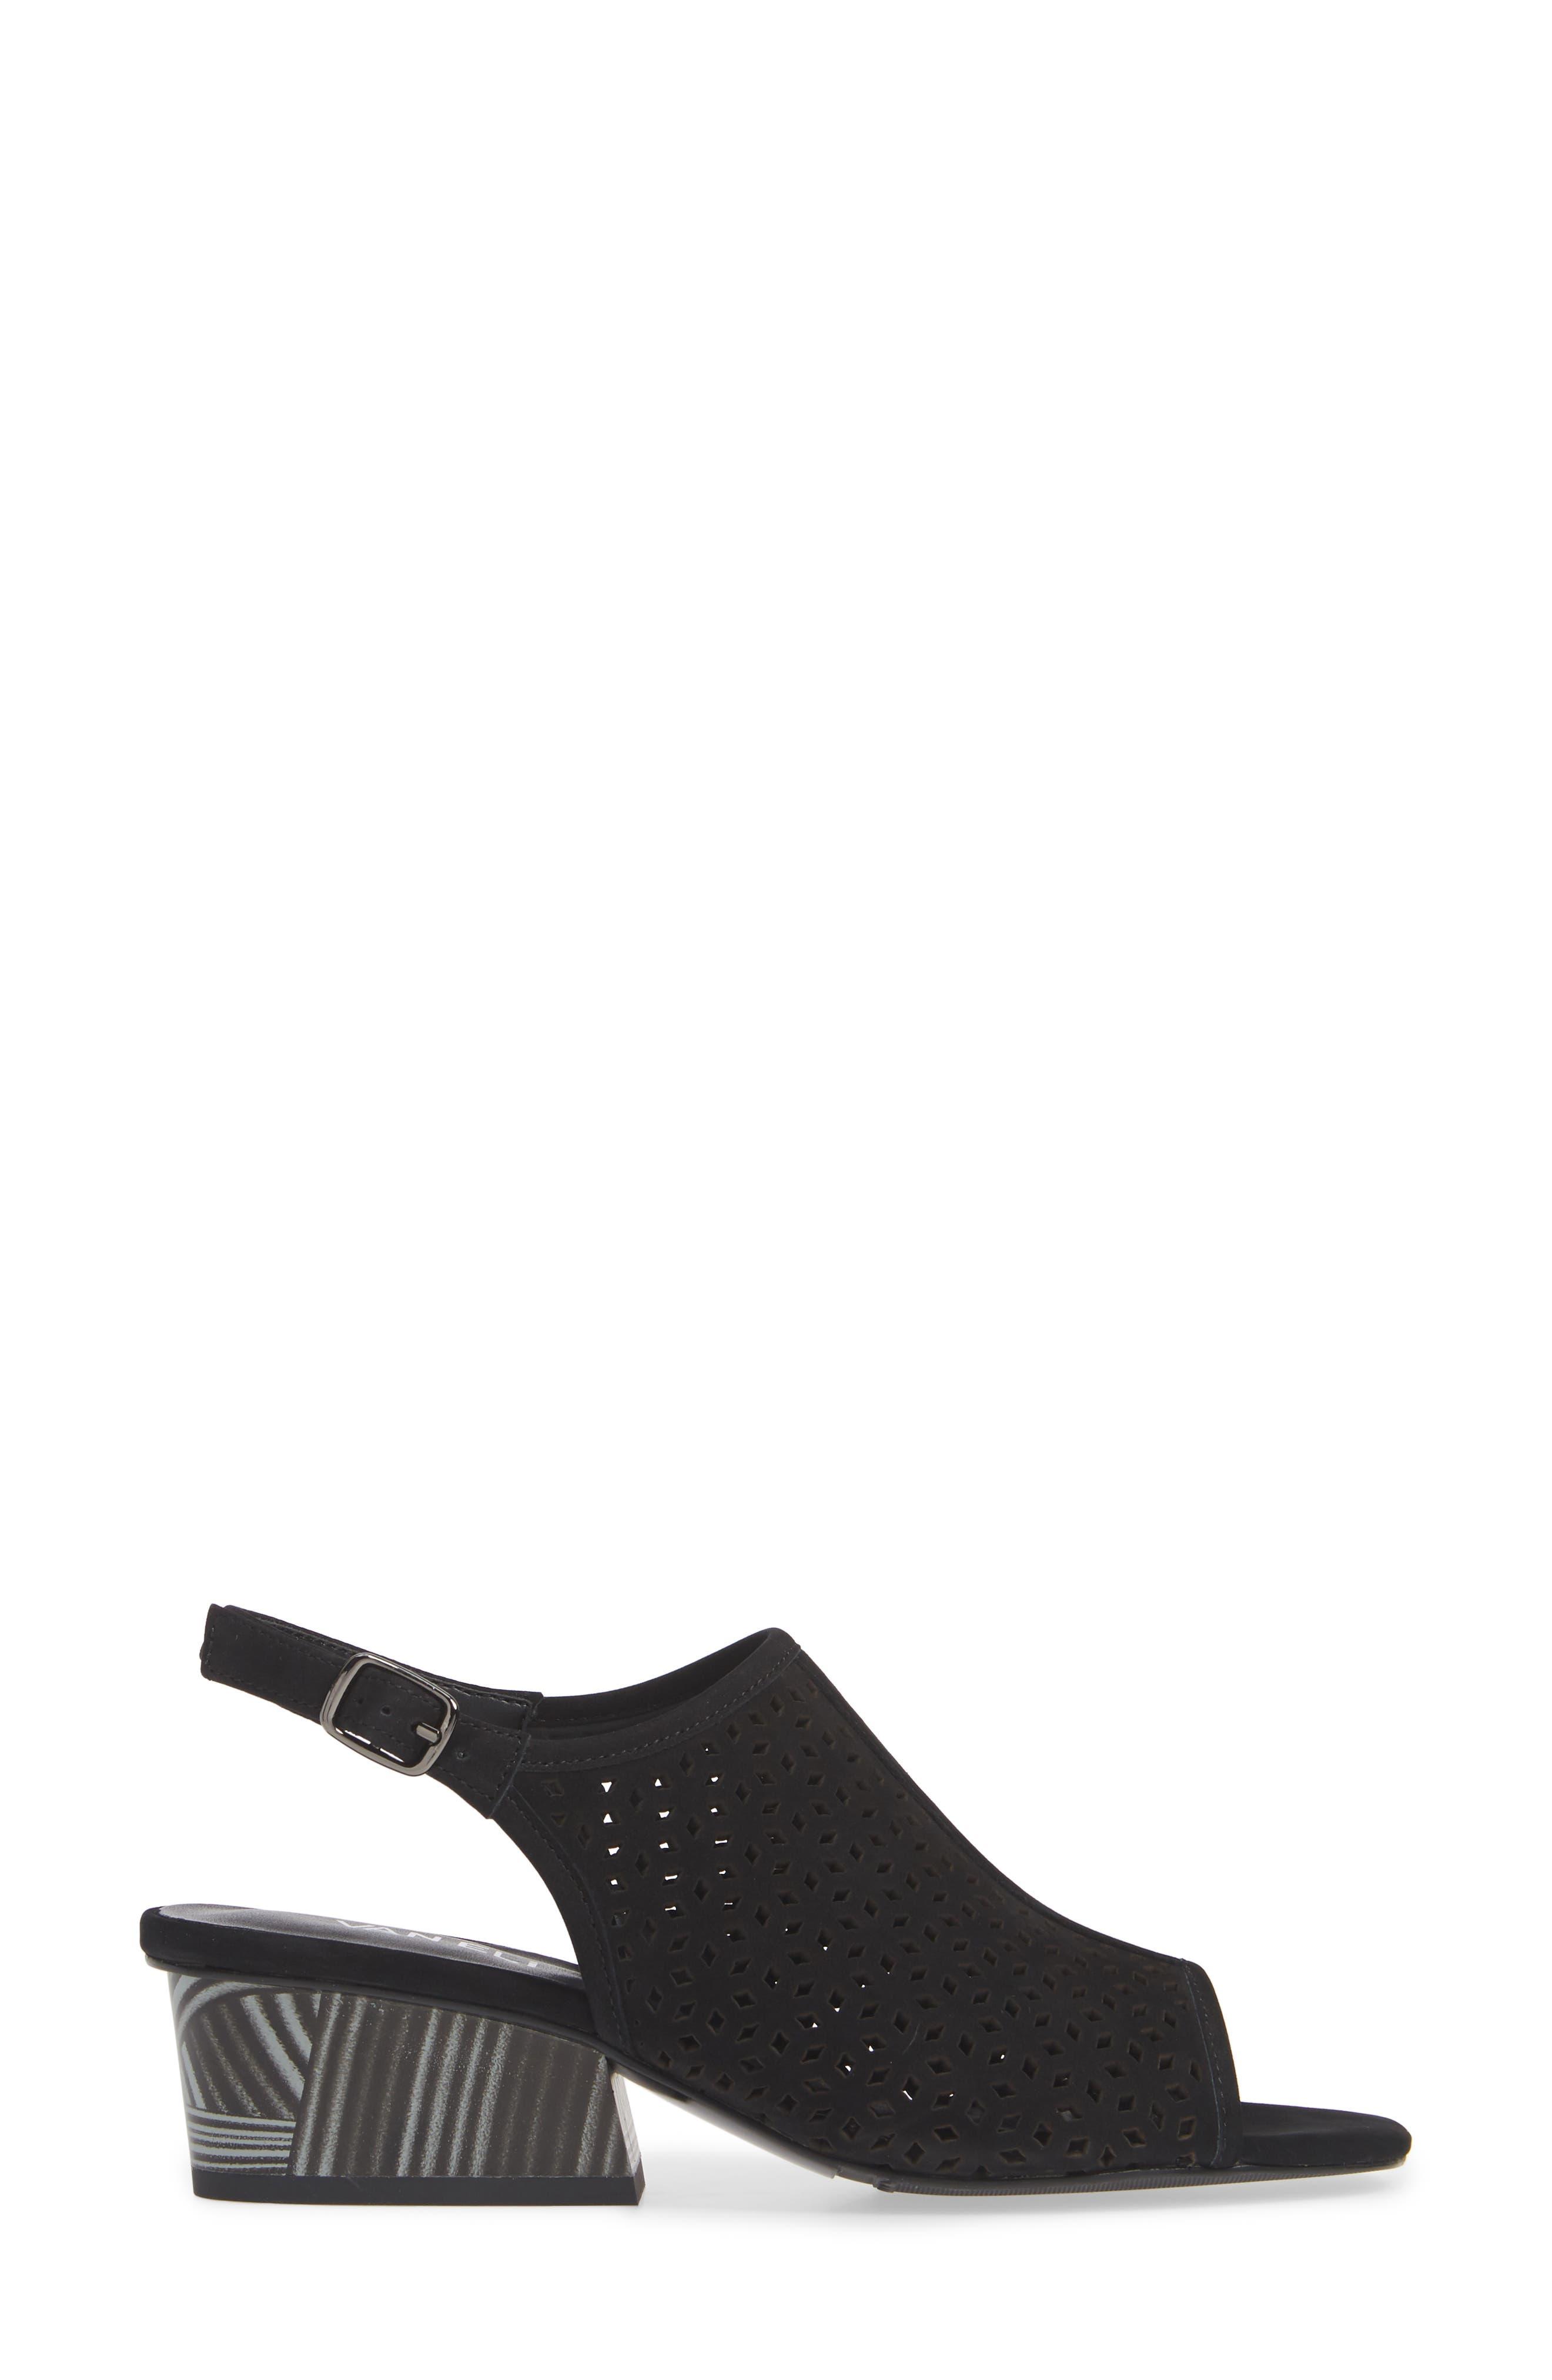 Candra Perforated Sandal,                             Alternate thumbnail 3, color,                             BLACK NUBUCK LEATHER